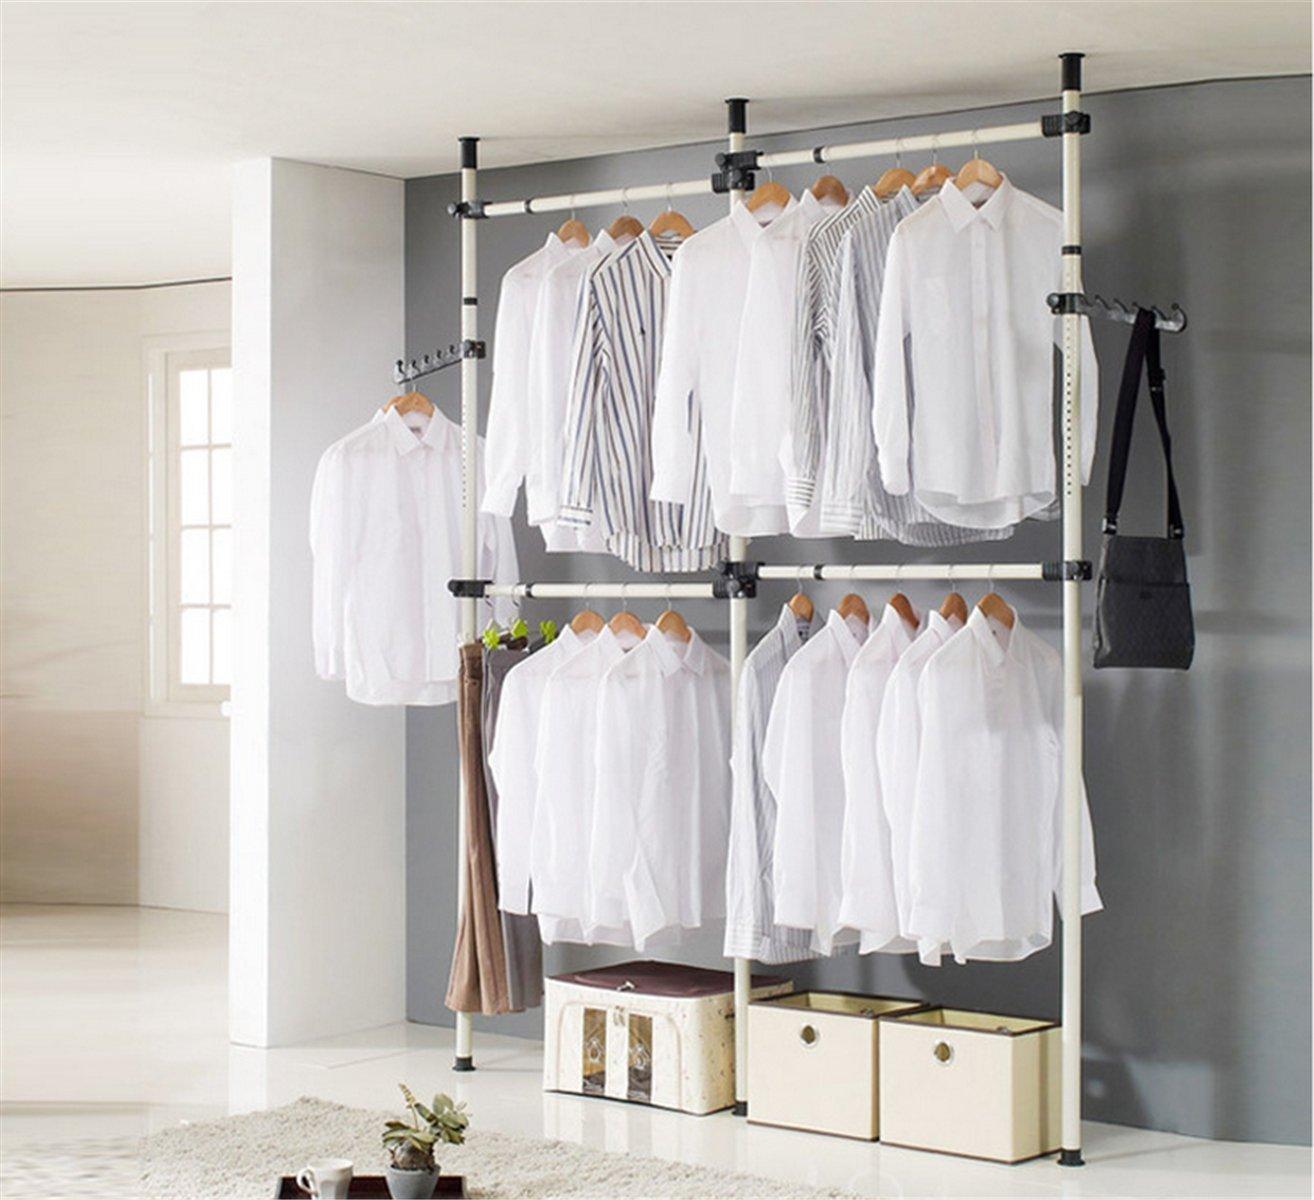 Estink Garment Rack,Portable Indoor Garment Hanger Tools Heavy-Duty Adjustable DIY Coat Hanger Clothes Wardrobe 3 Poles 4 Bars Home Hanging Rack